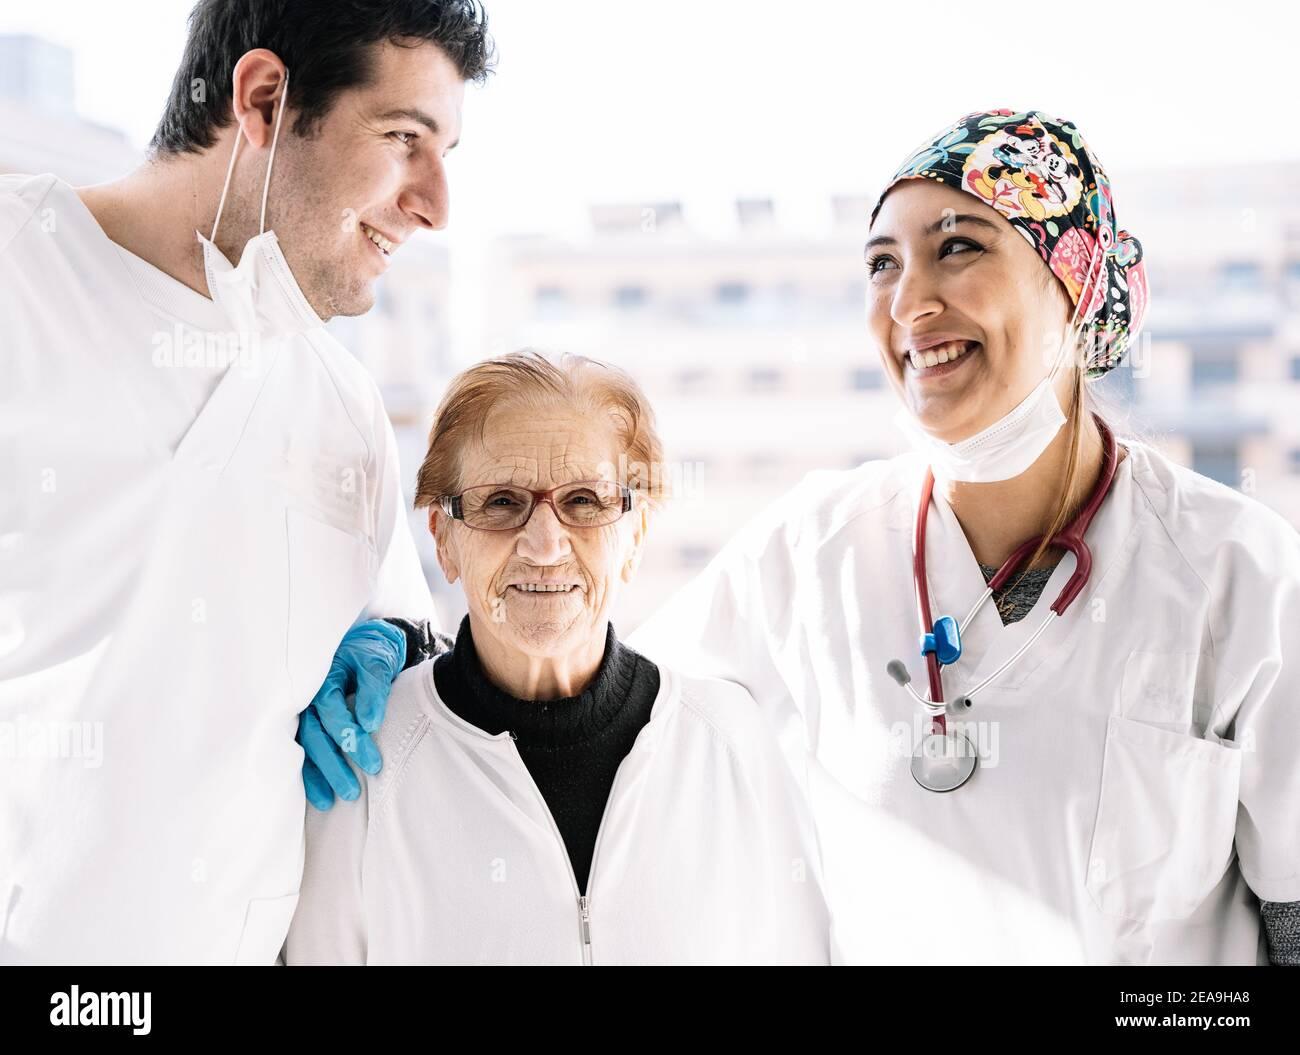 Verliebt in patientin physiotherapeut